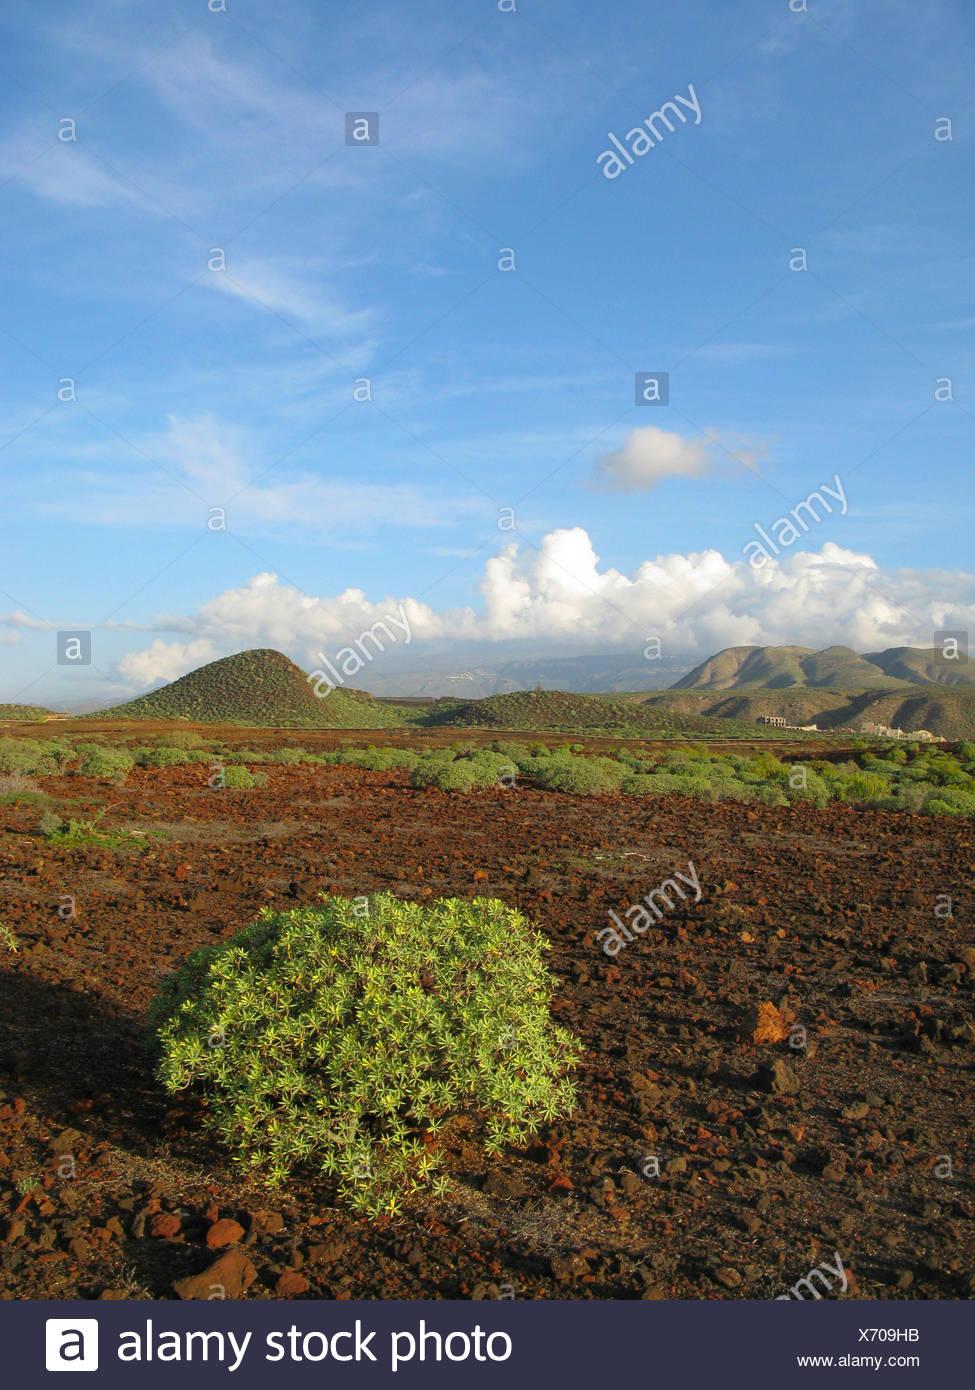 spurge (Euphorbia balsamifera), on volcanic rocks in the coastal aerea in the southwest, Canary Islands, Tenerife, Pal Mar - Stock Image